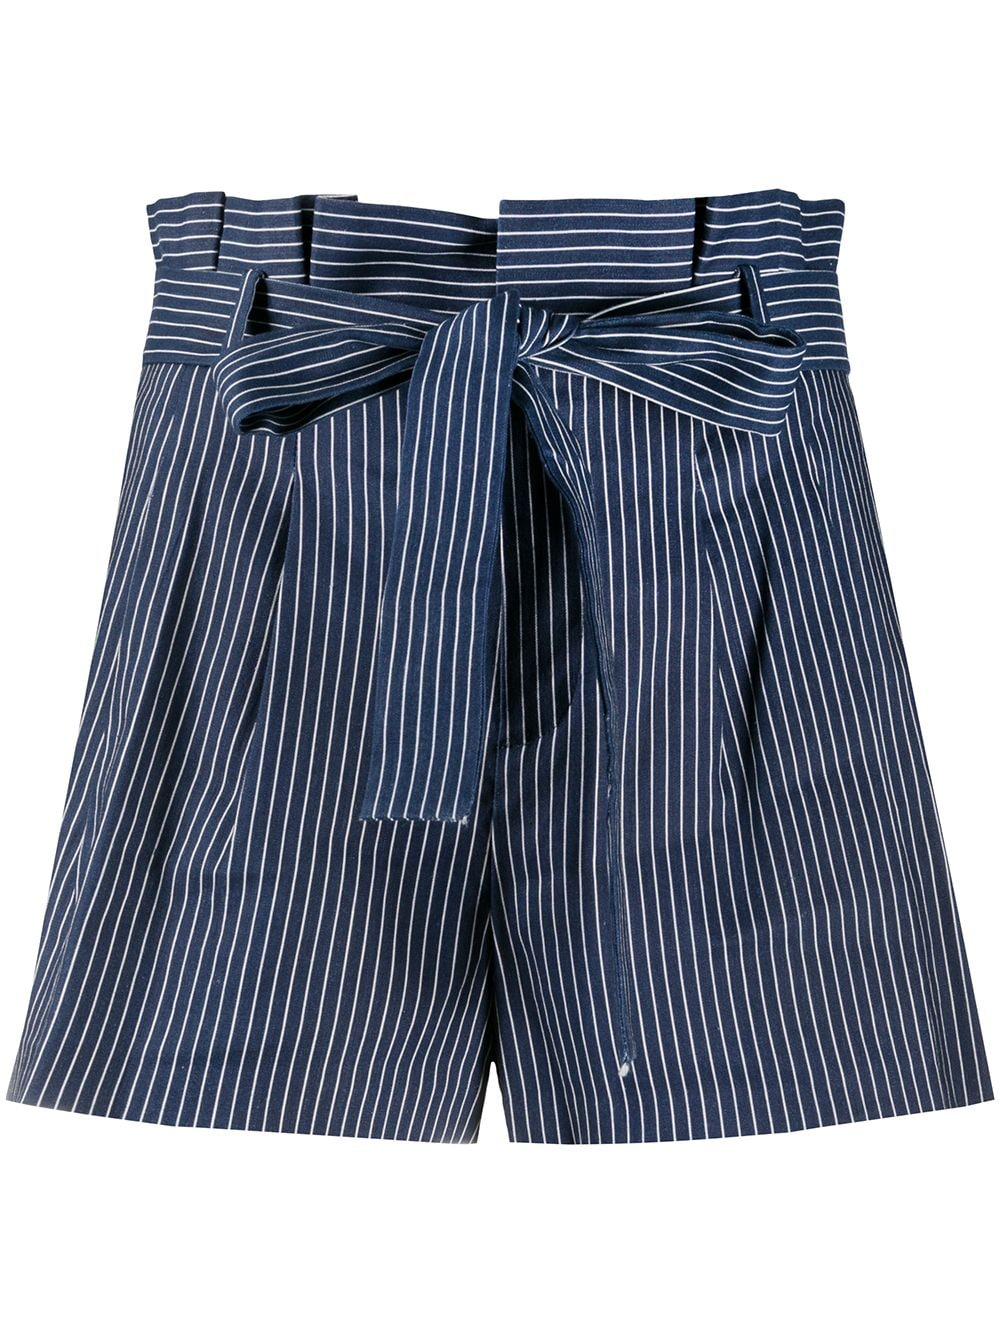 Laurine Linen Shorts